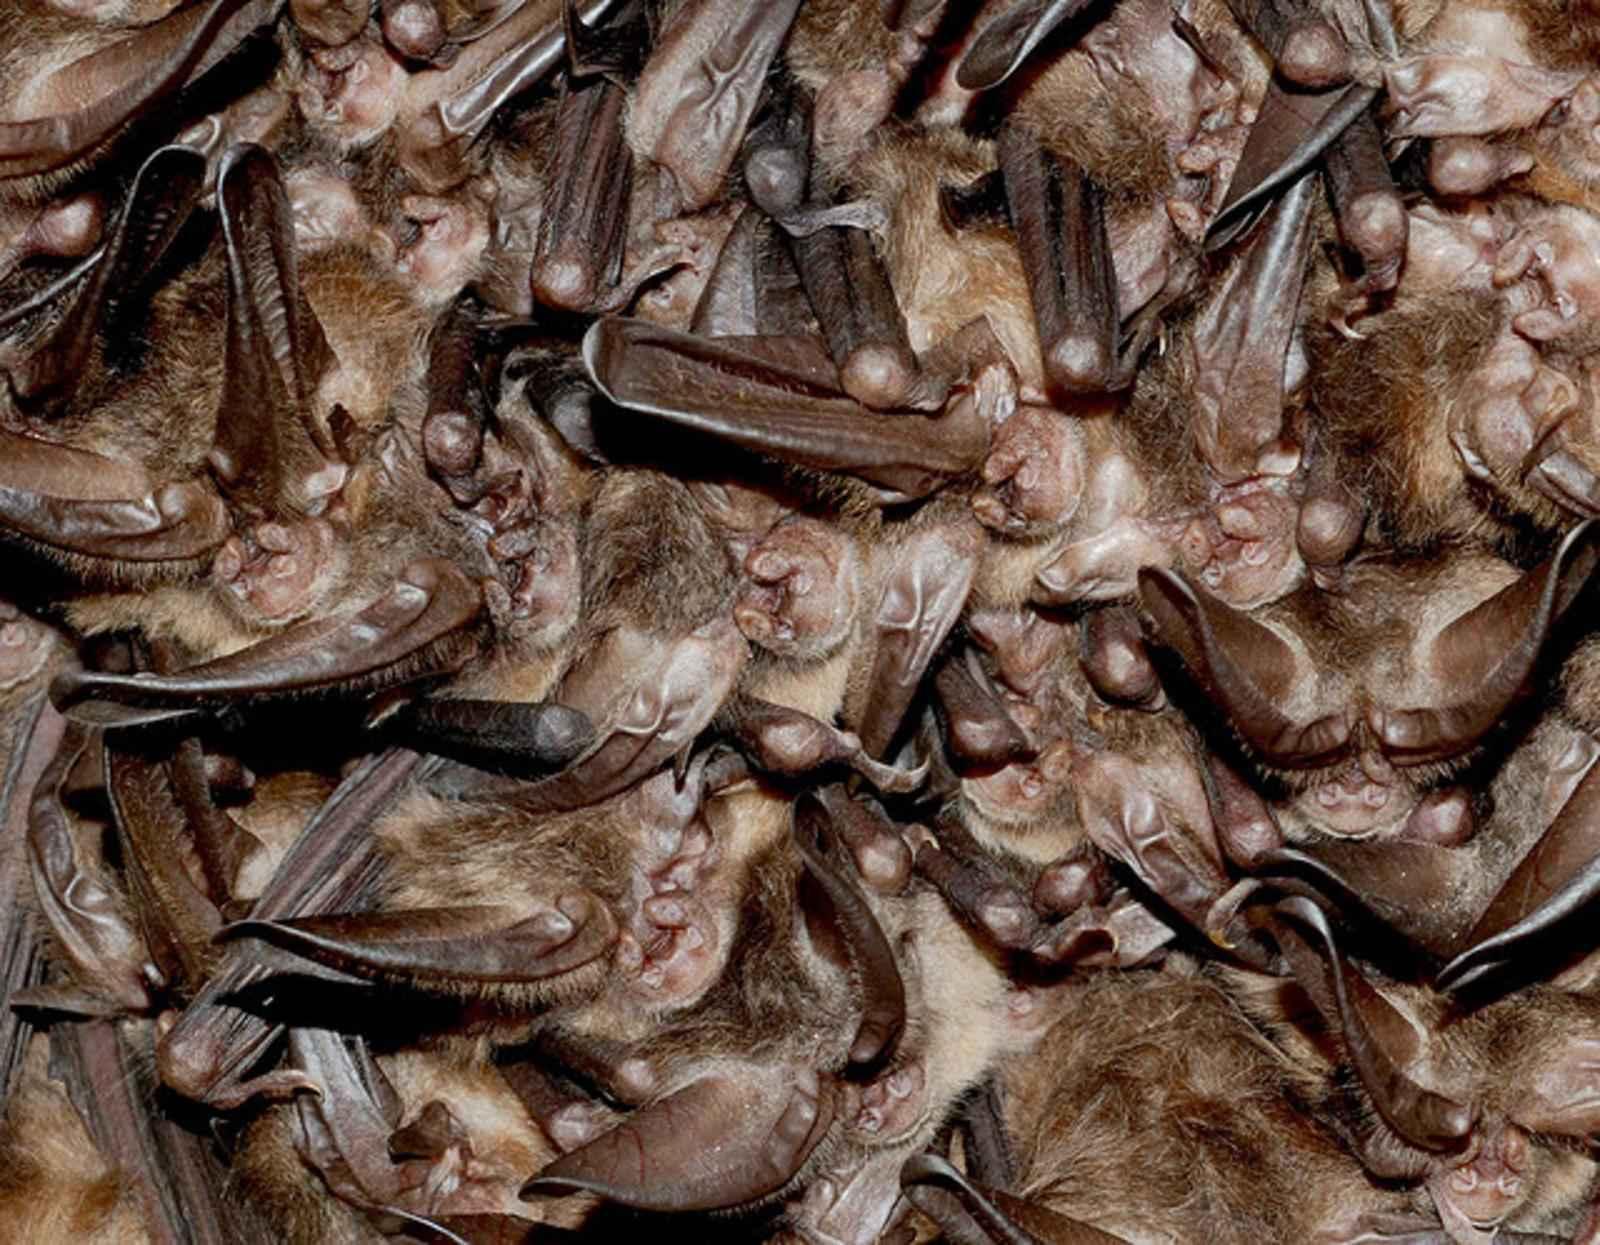 Cluster_of_hibernating_virginia_big_eared_bats.jpg